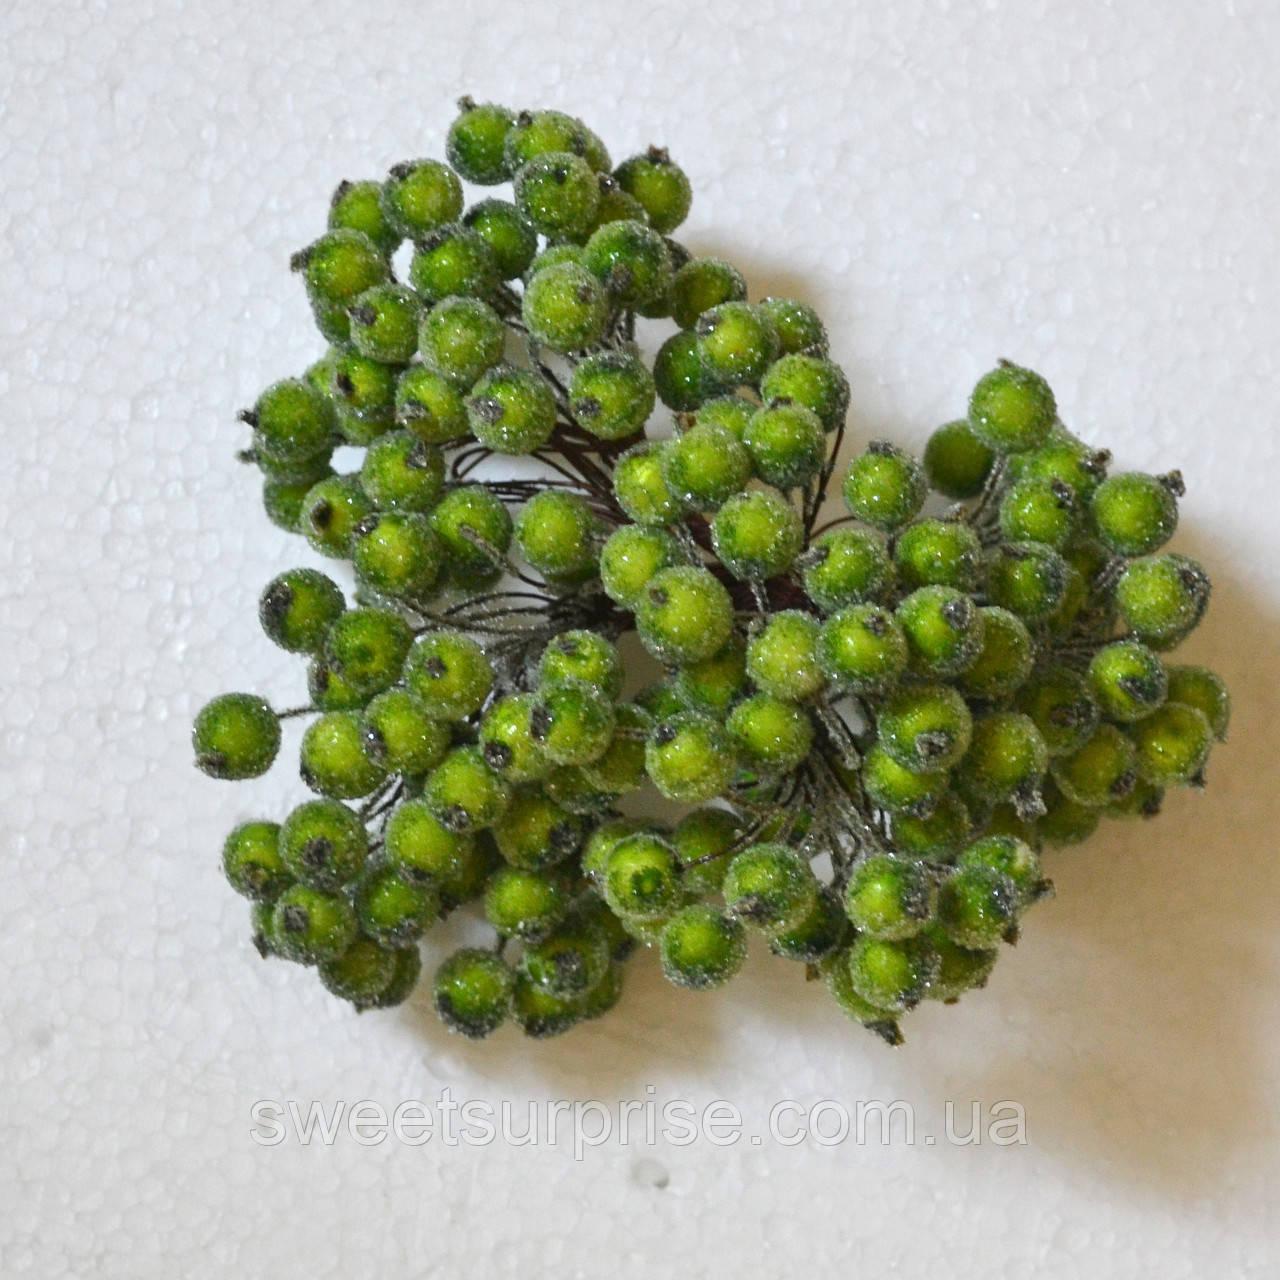 Калина в сахаре (зеленый)